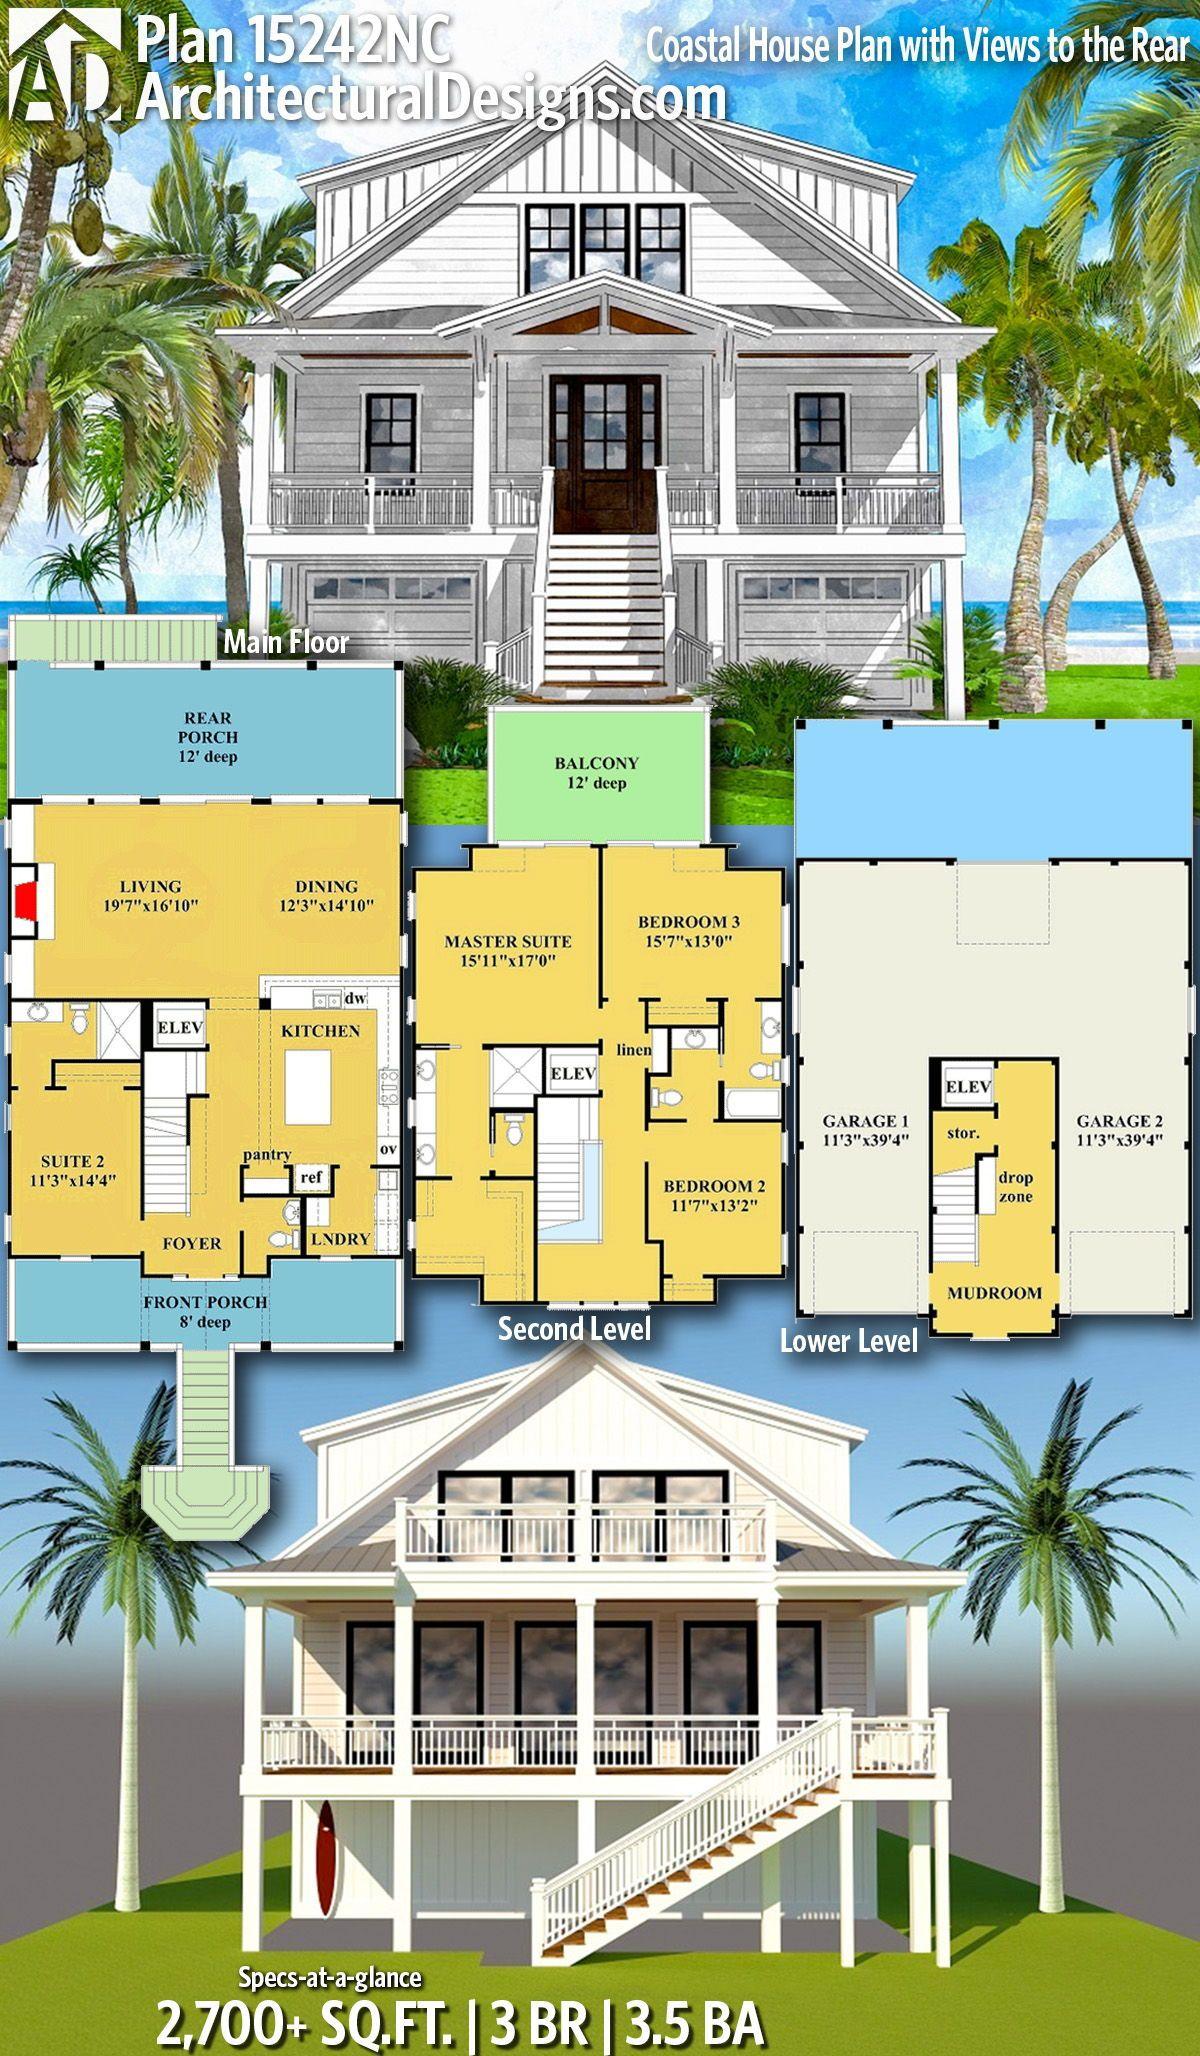 Plan 15242nc Coastal House Plan With Views To The Rear Beach House Floor Plans Beach Cottage House Plans Coastal House Plans